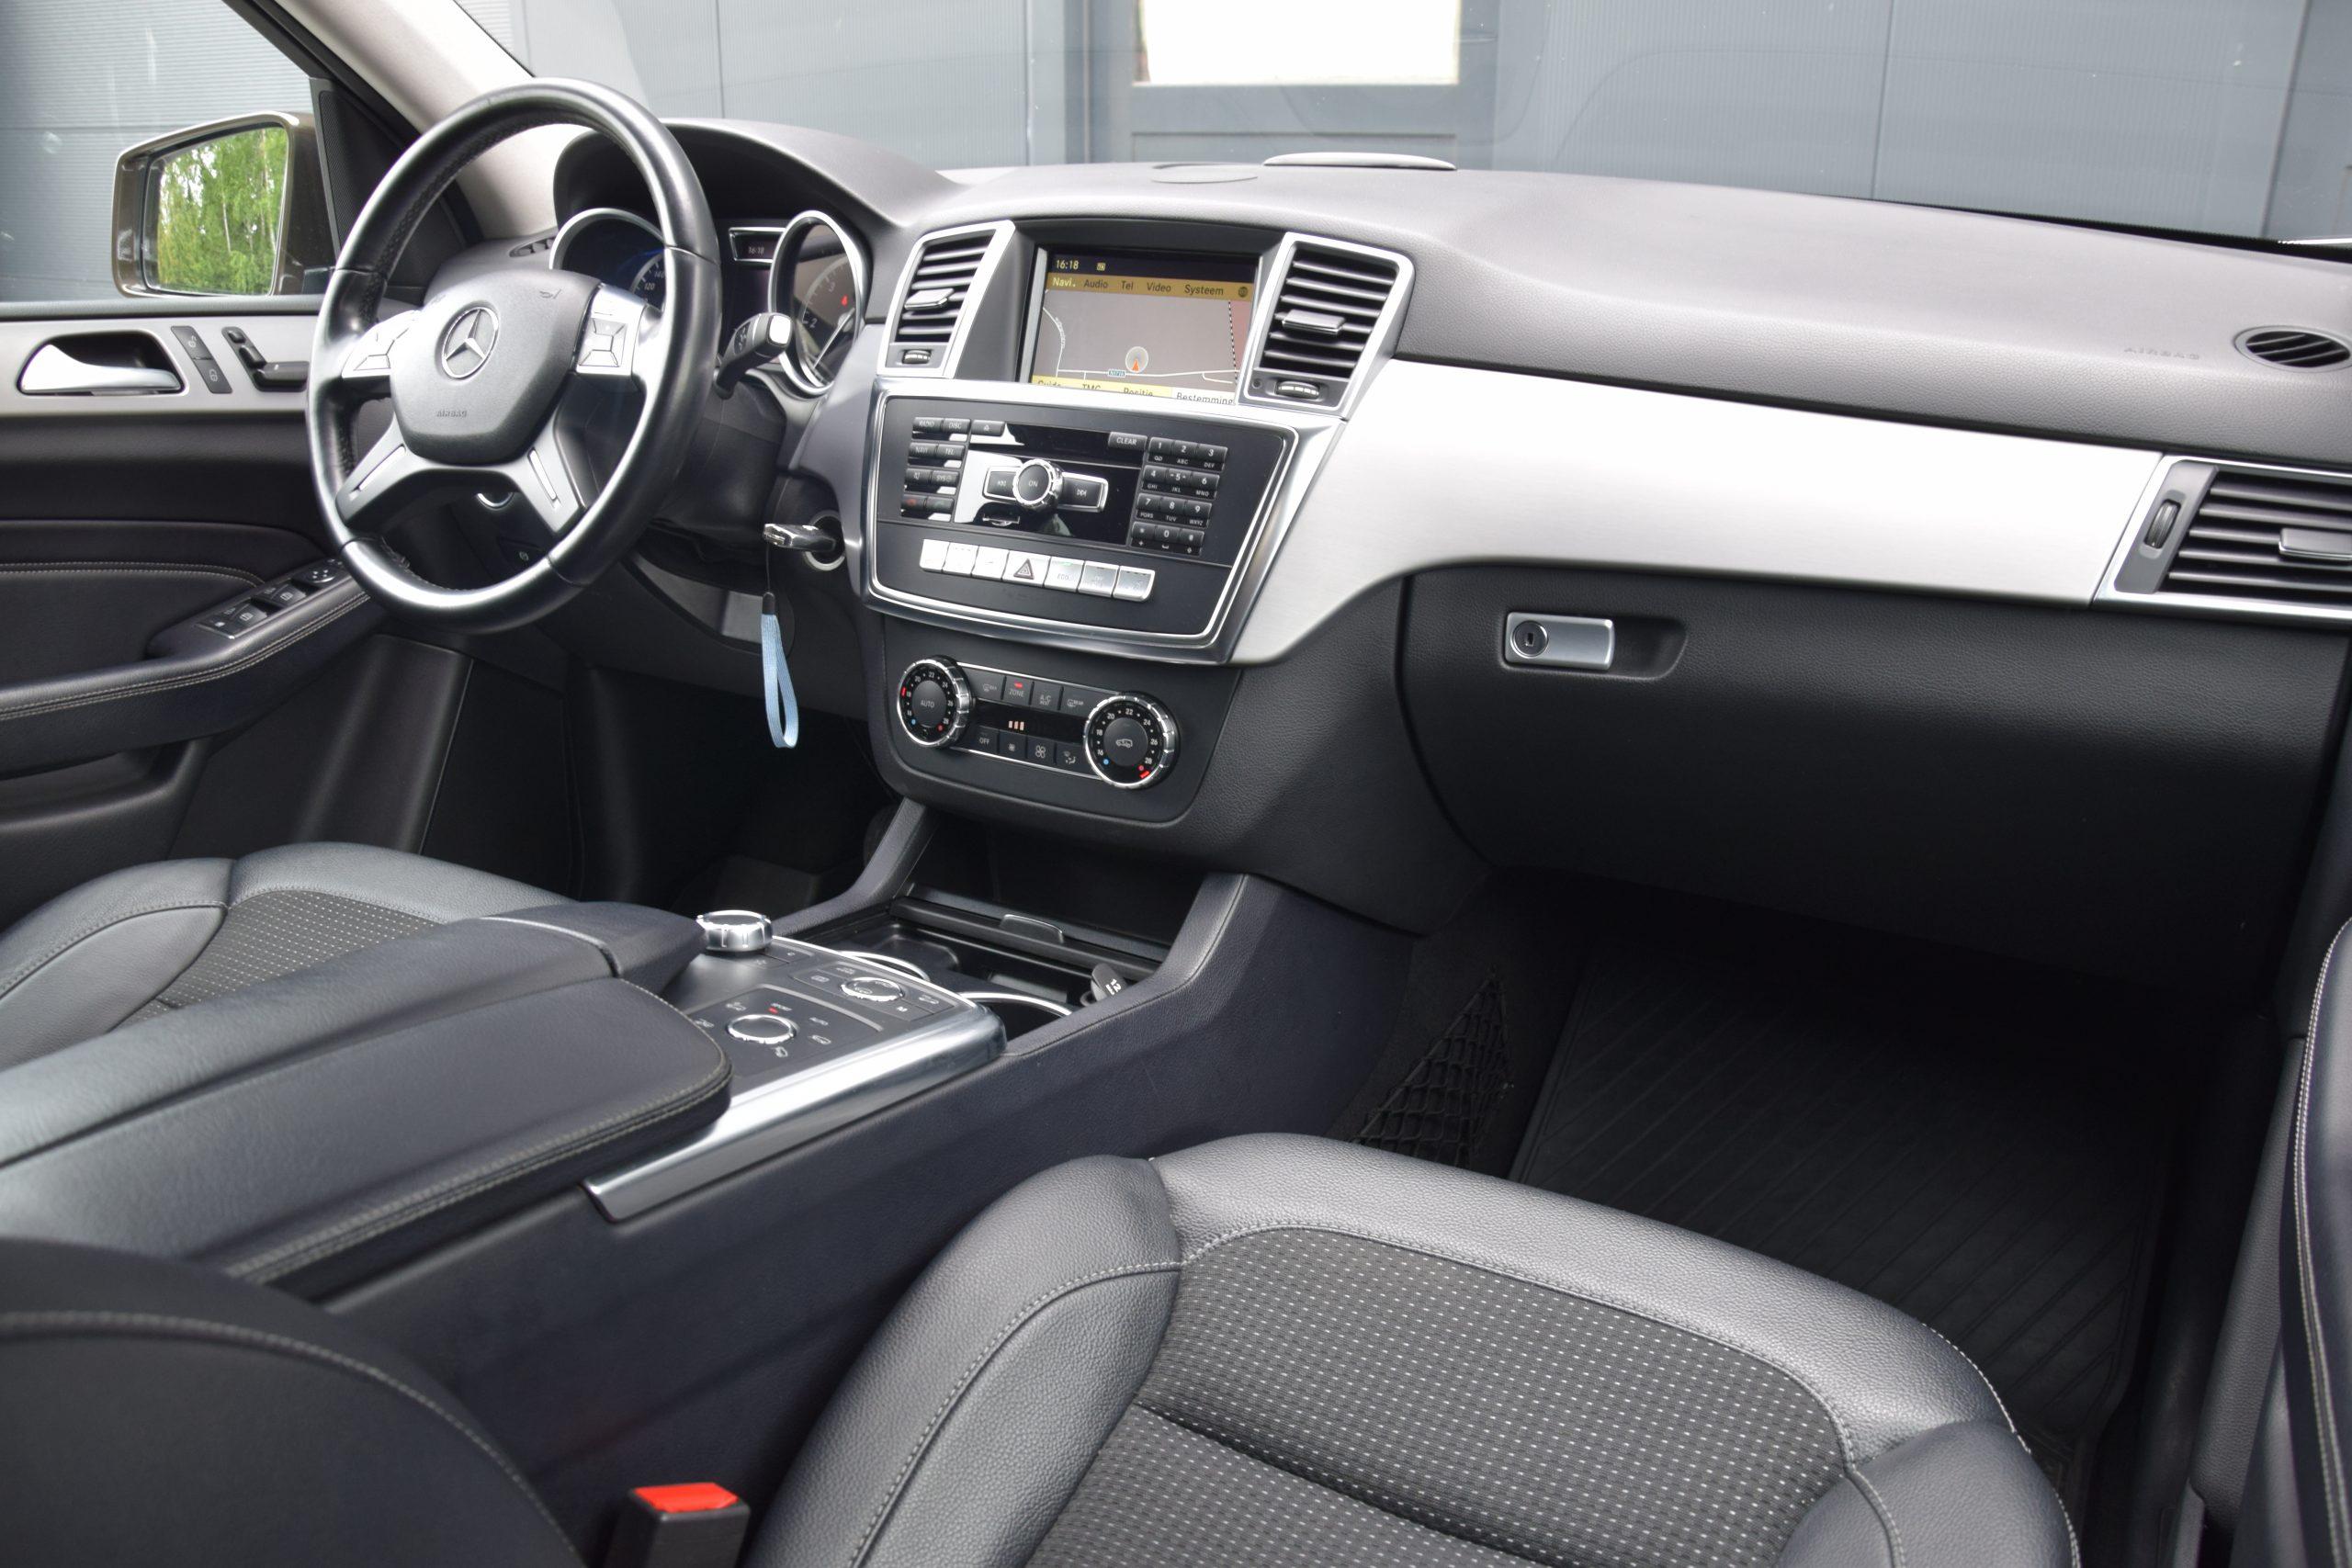 Mercedes-Benz ML 250 BlueTec 4-Matic 7G- Offroad Pakket – Luchtveringen!! 08/2012